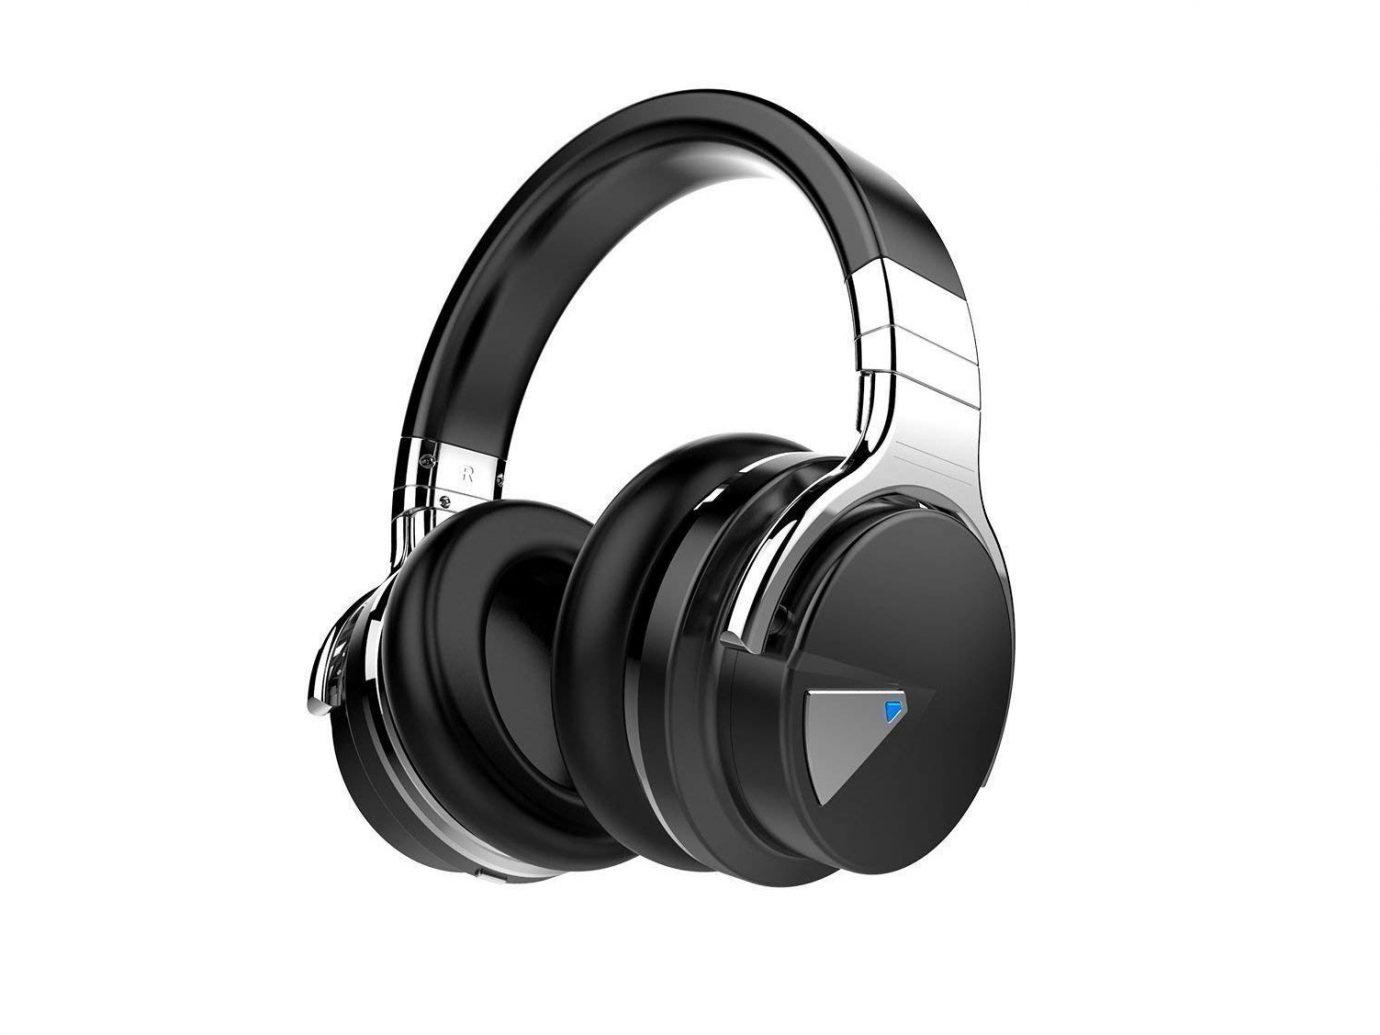 COWIN E7 Active Noise Canceling Headphones Bluetooth Headphones https://amzn.to/2GWLdU4